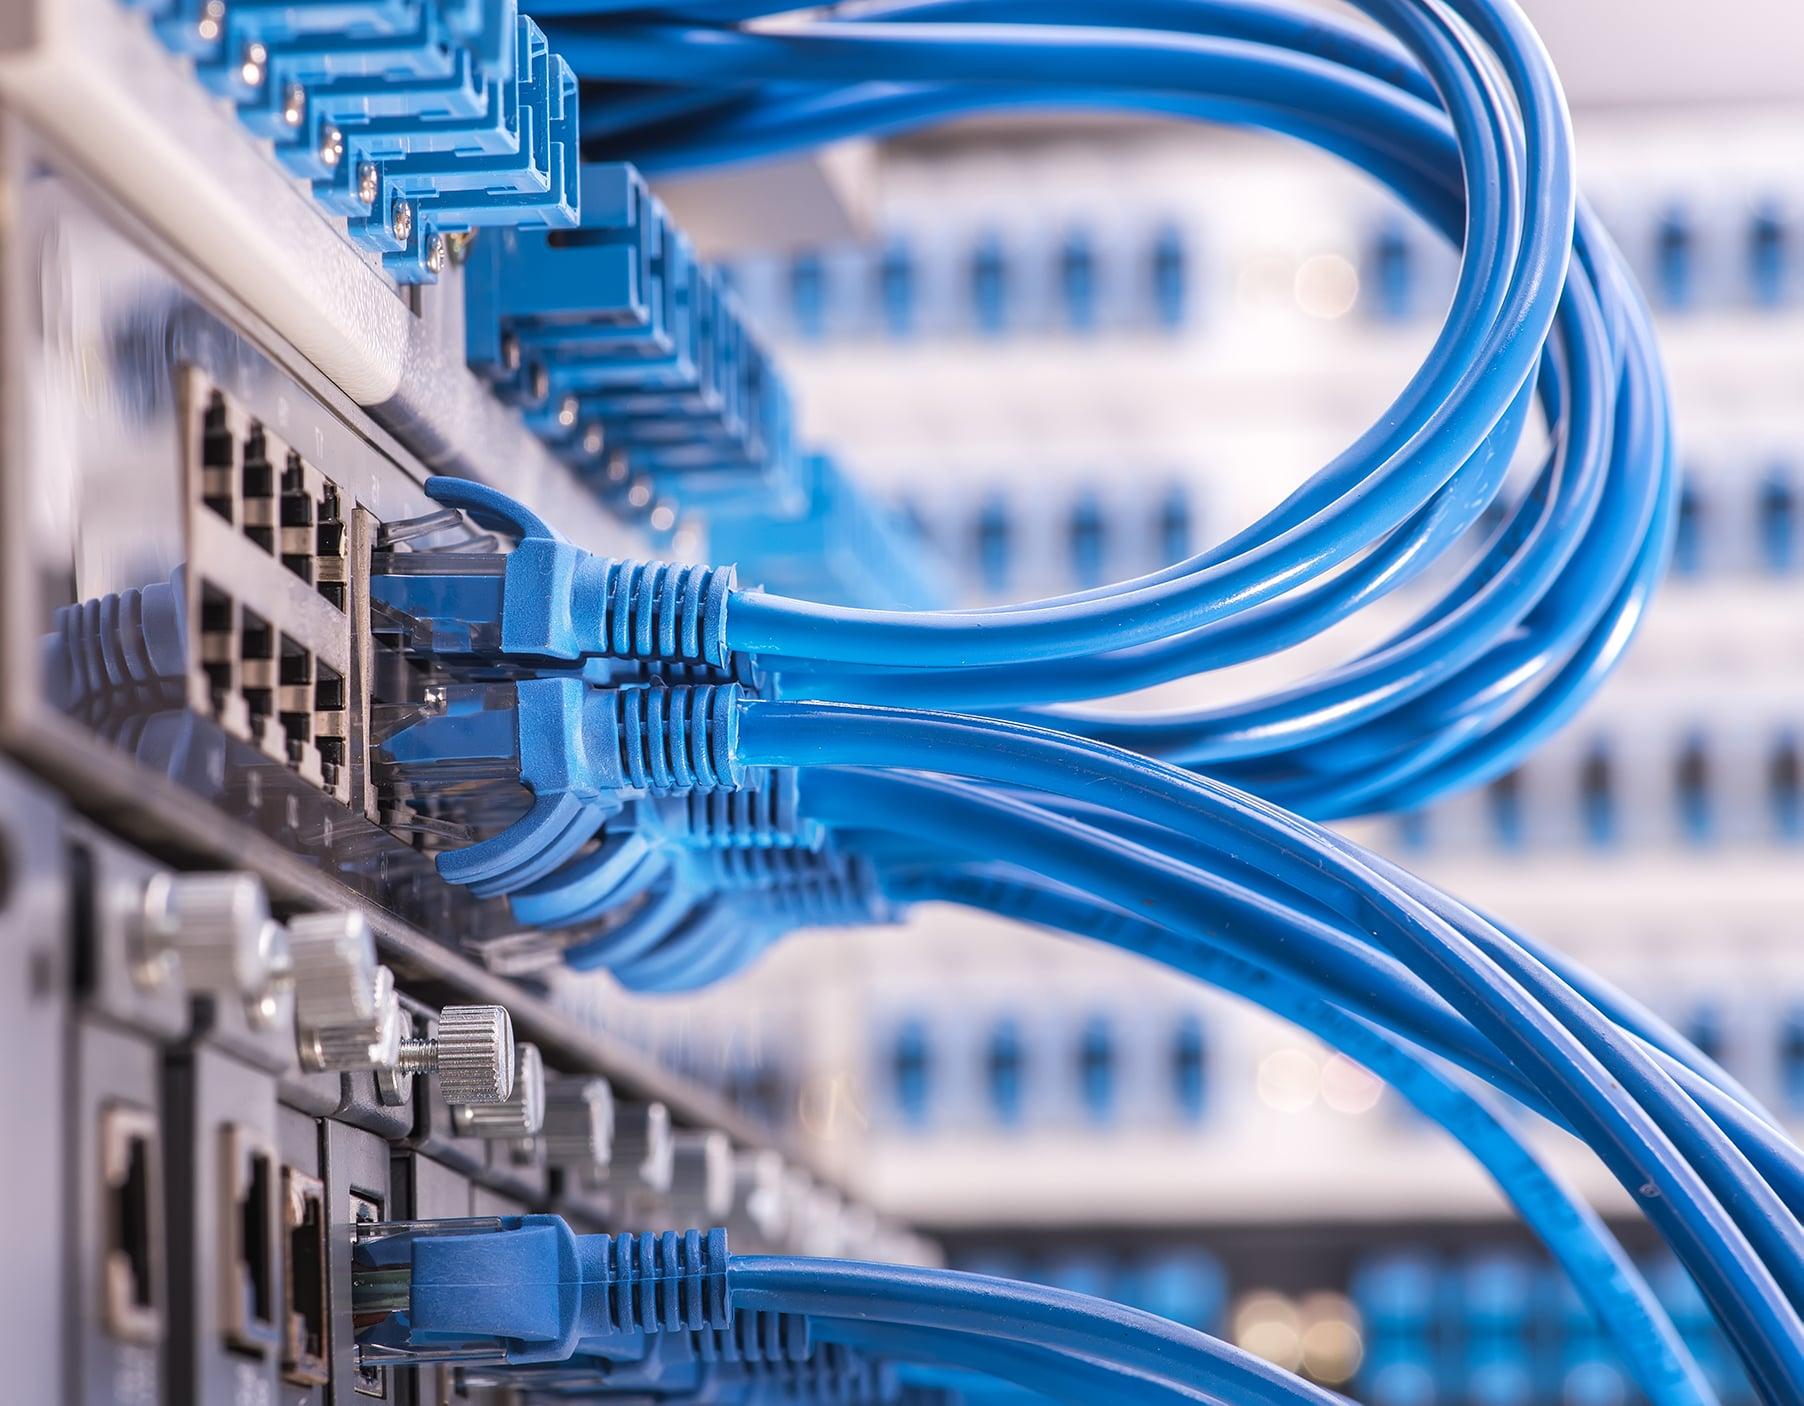 server-cables.jpg